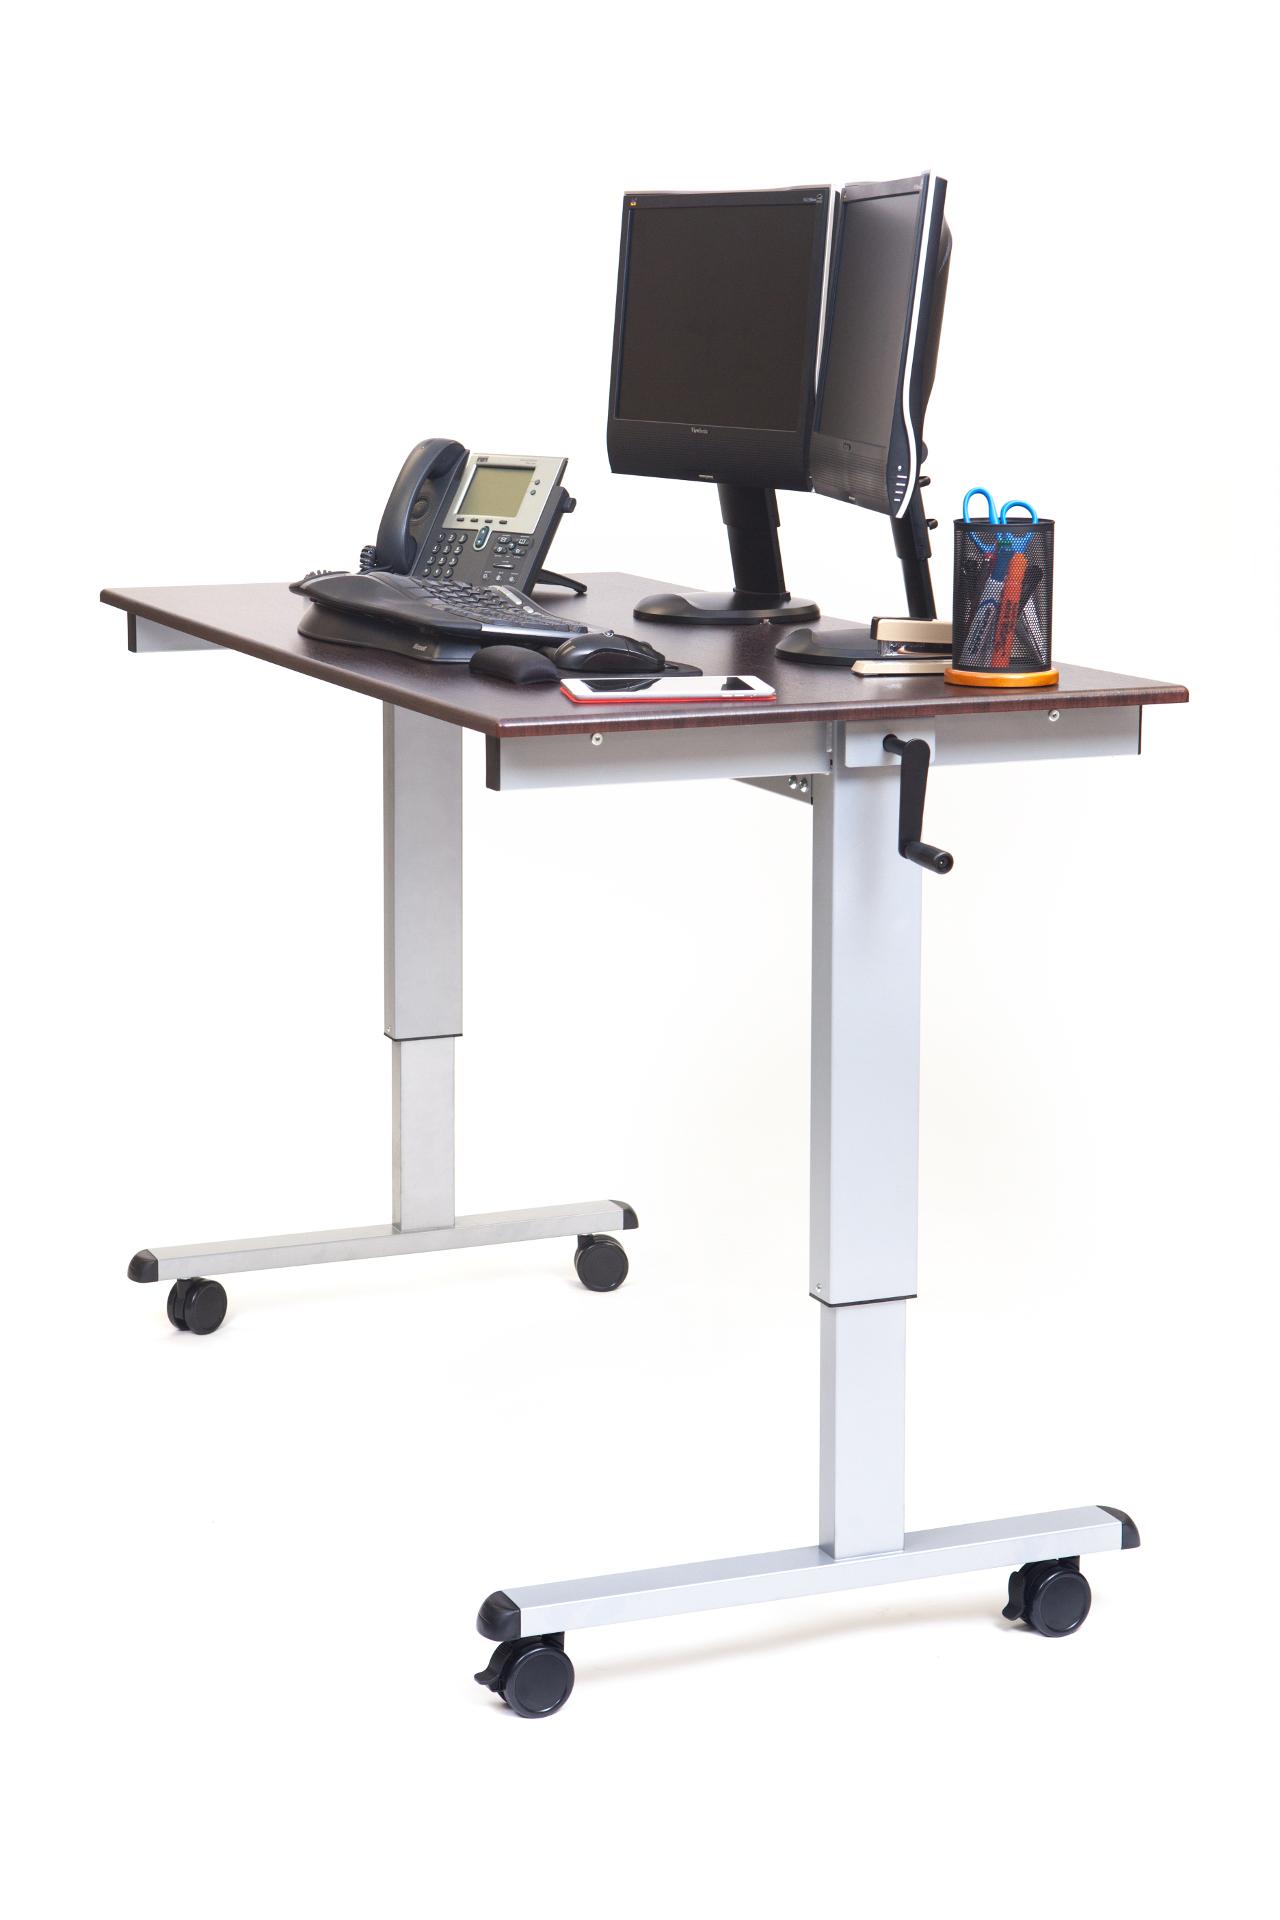 Luxor 60 Hand Crank Adjustable Stand Up Desk NotSittingcom